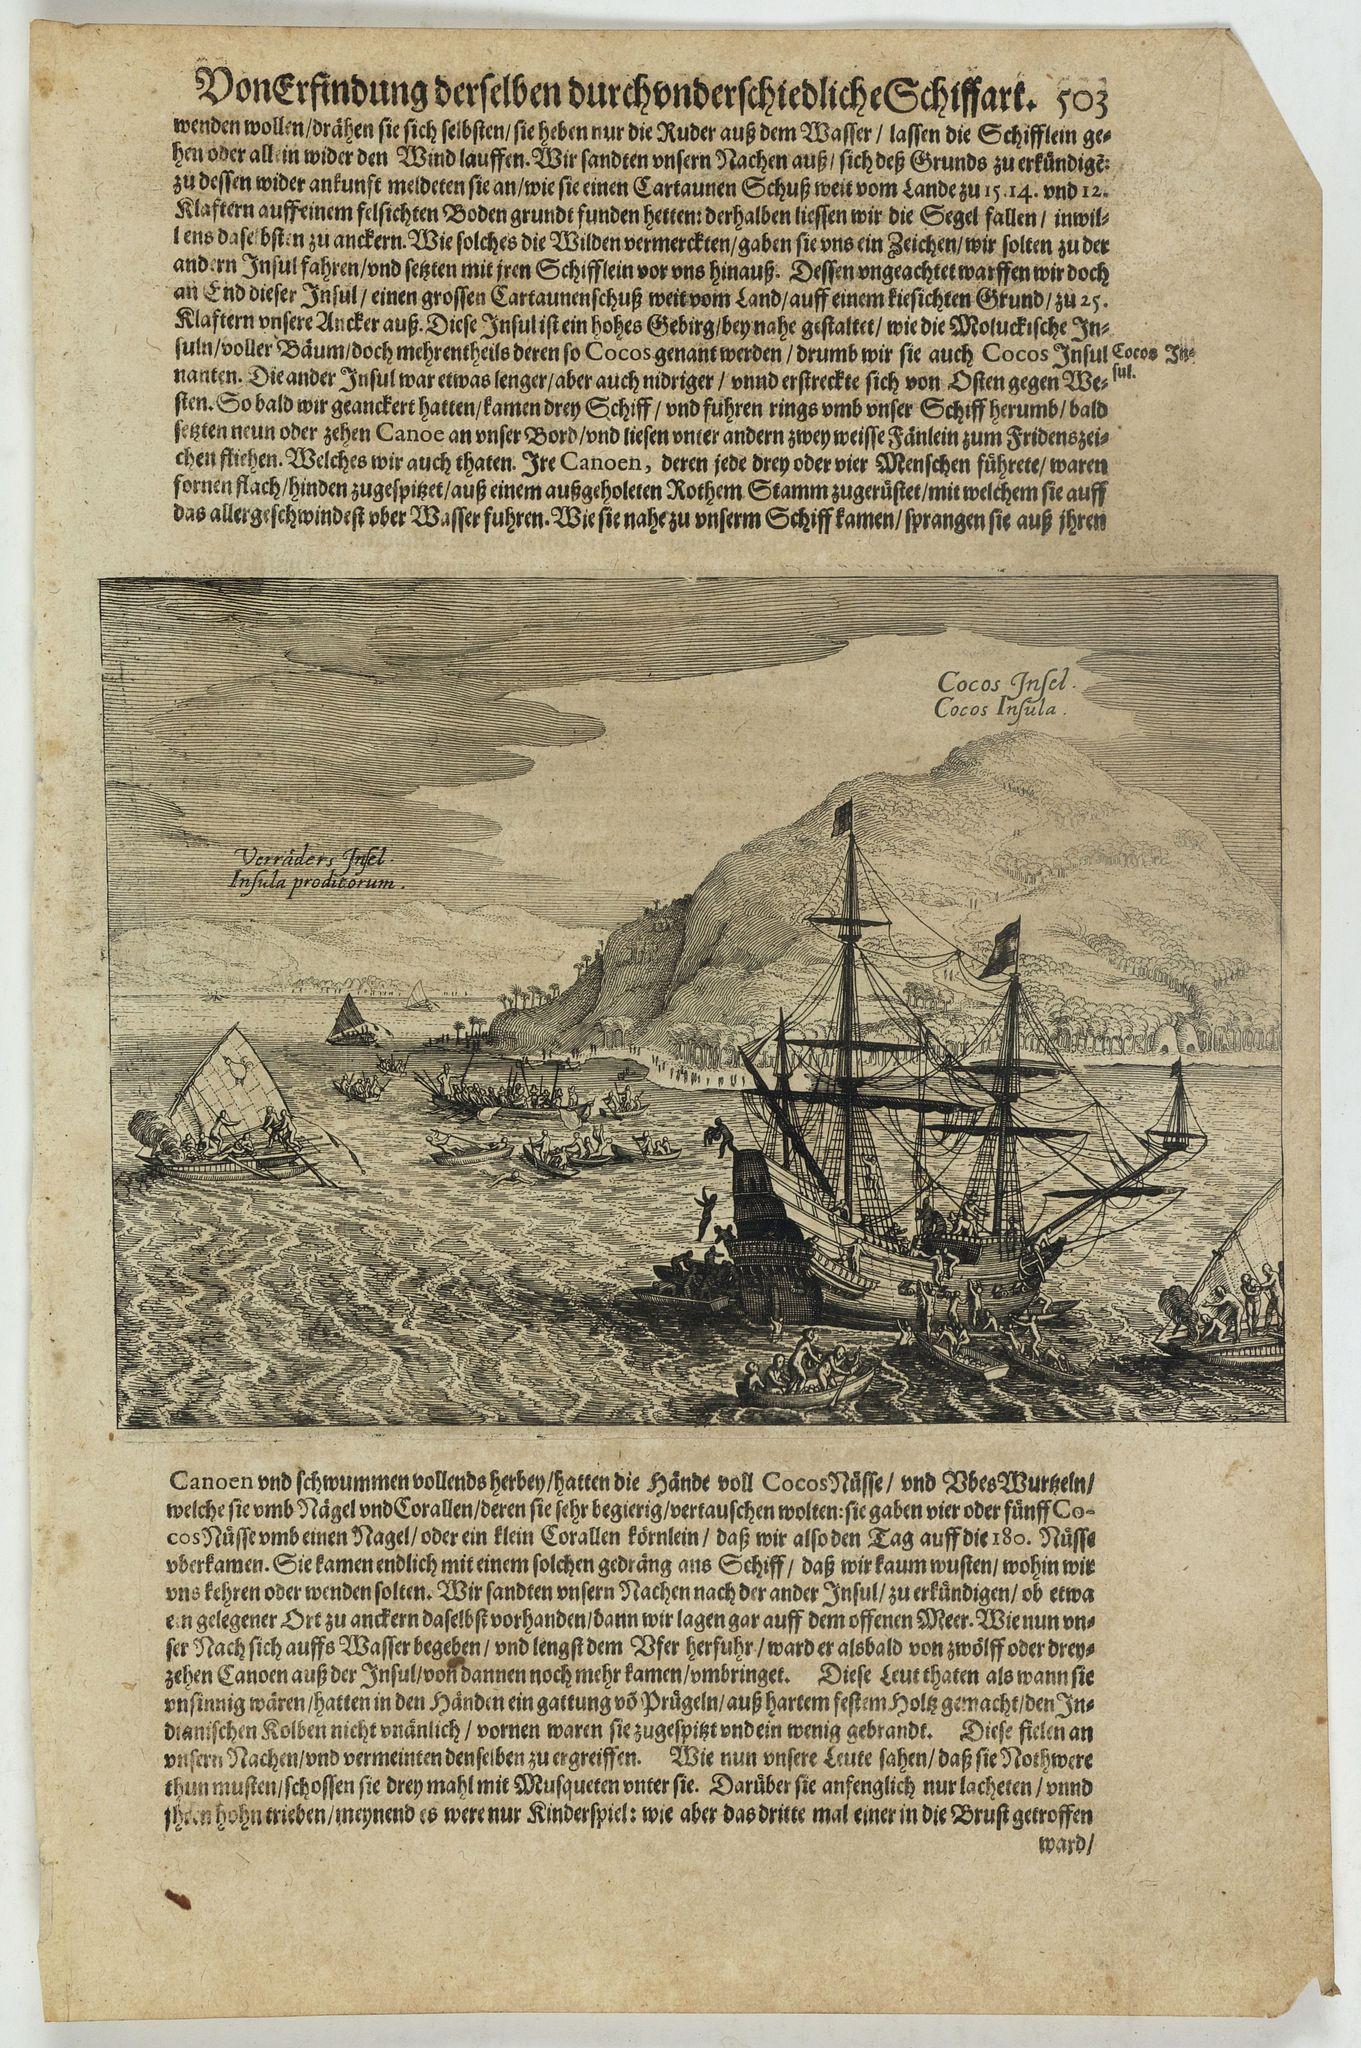 GOTTFRIED, J.L. -  Cocos Insel Cocos Insula / Verräter Insel Insula proditorum.